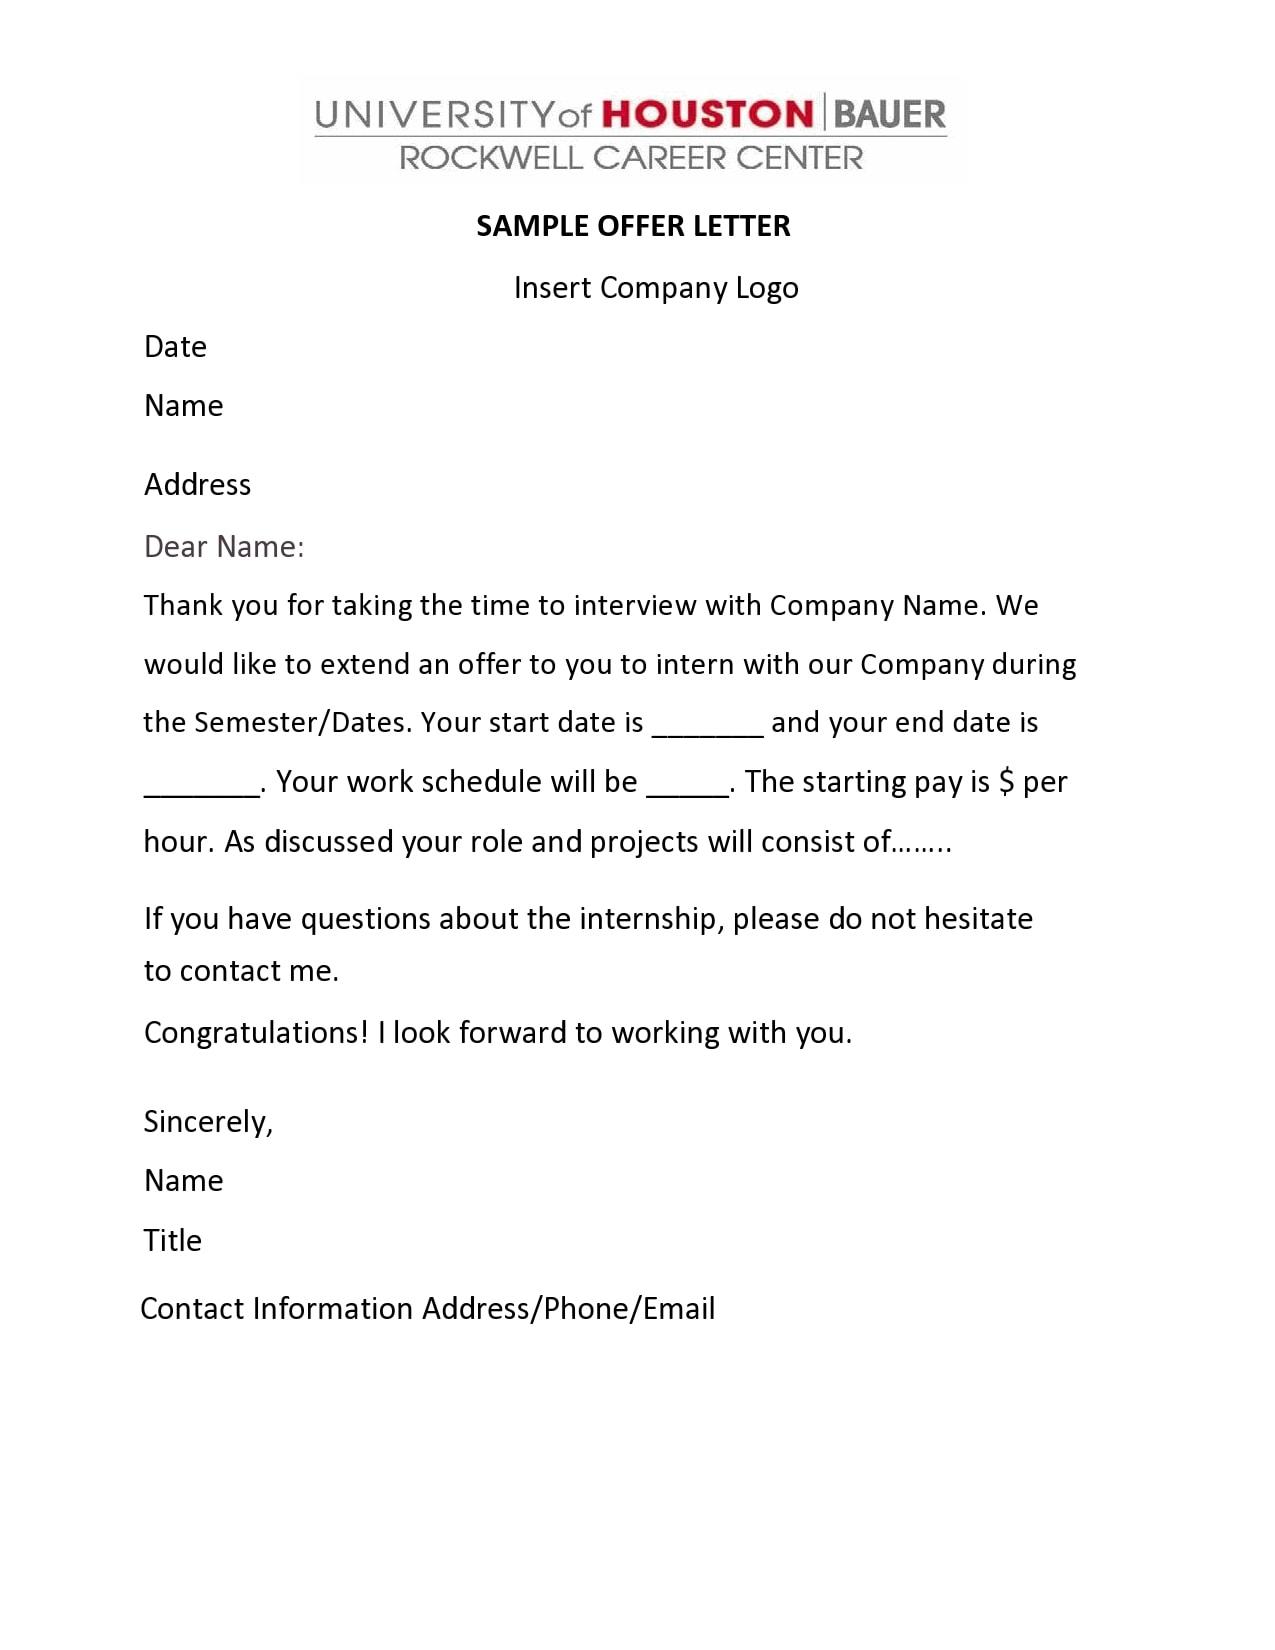 internship offer letter 08